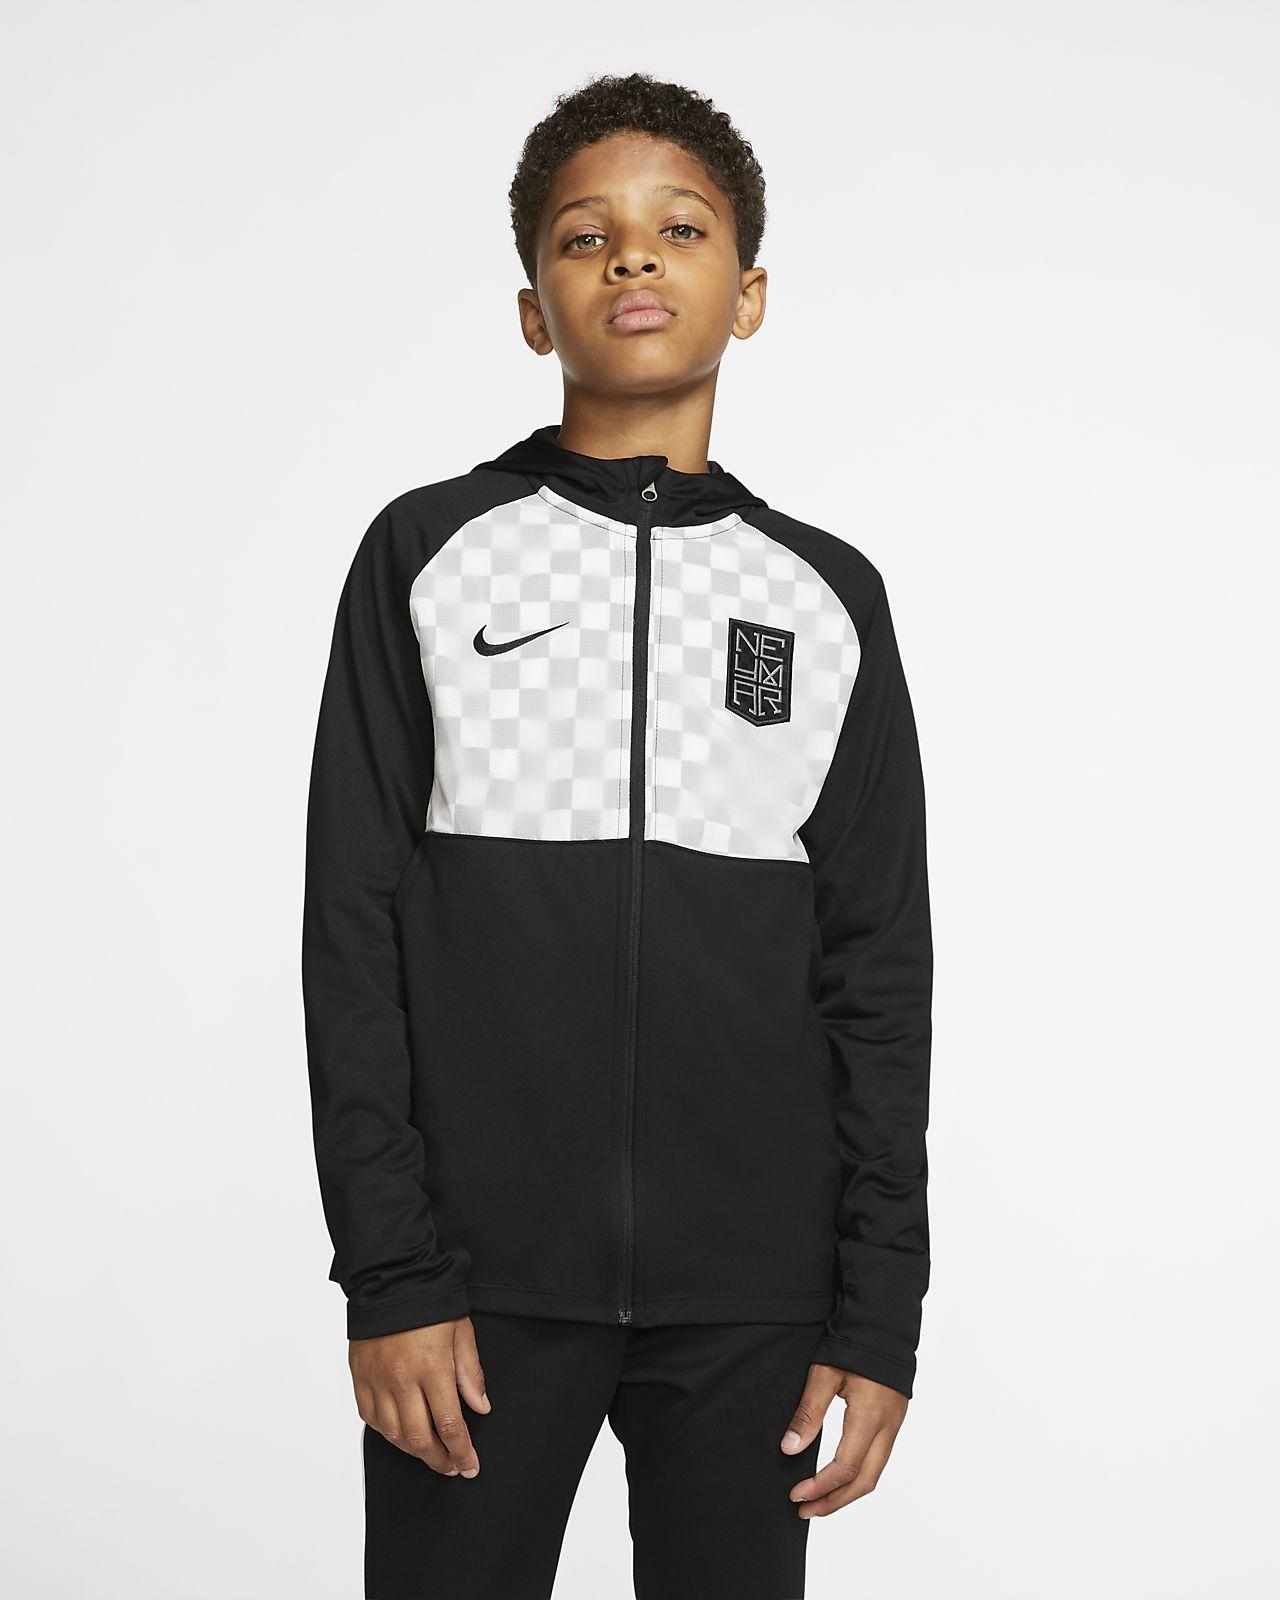 Nike Dri-FIT Neymar Jr. Fußballjacke für ältere Kinder